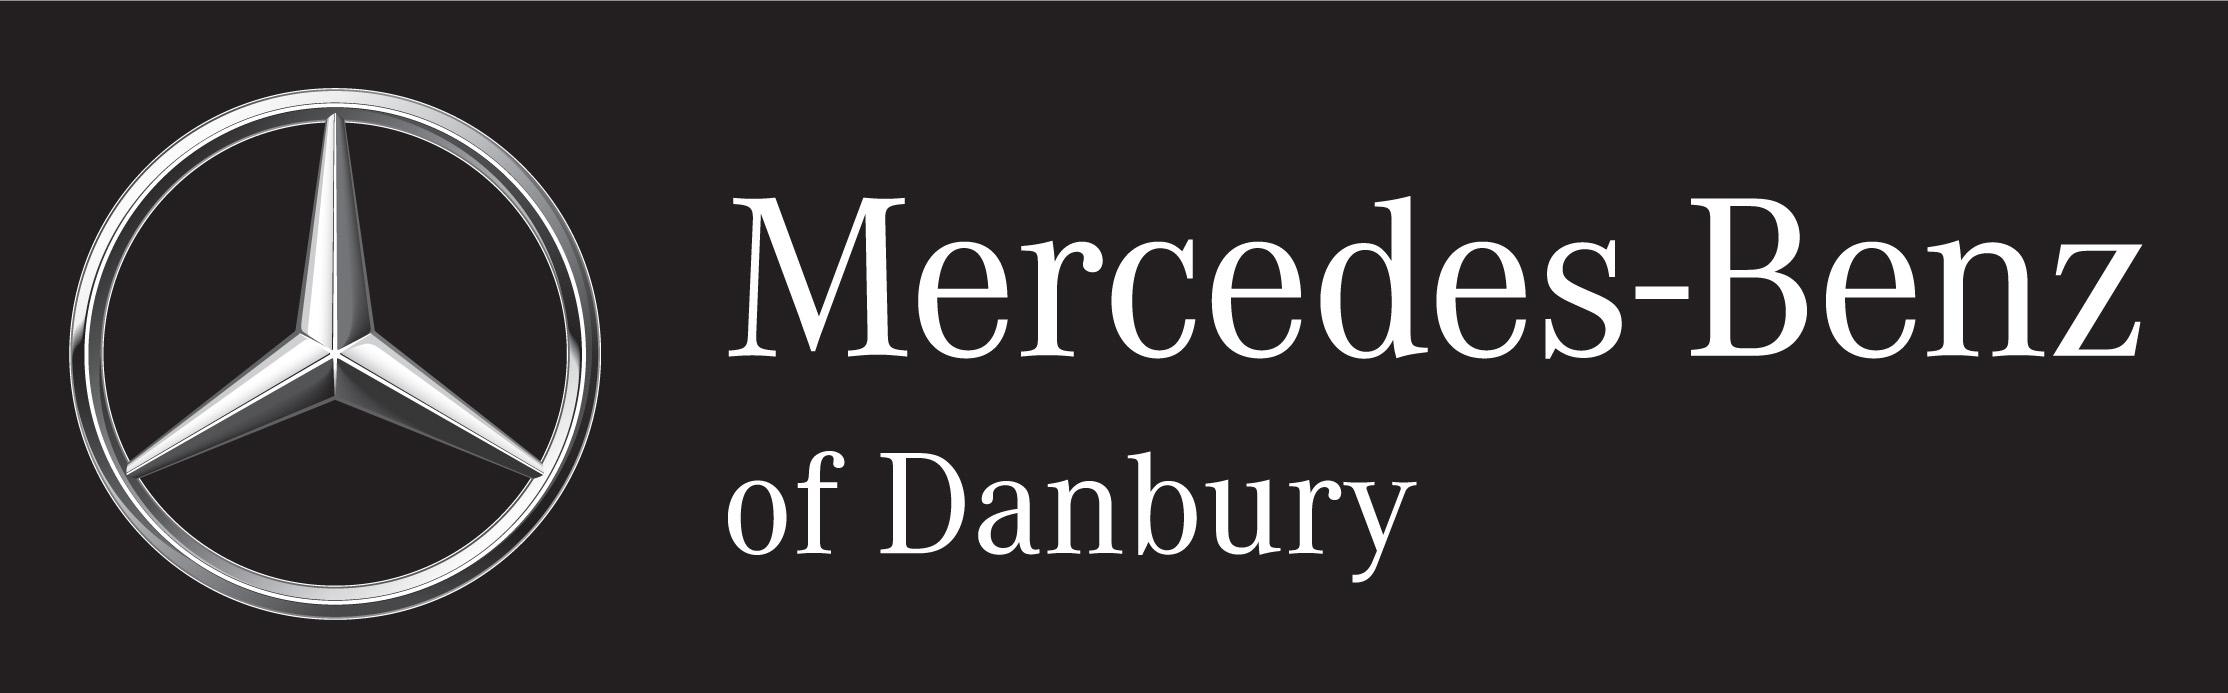 Mercedes benz of danbury presents the linda eder master for Mercedes benz of danbury ct